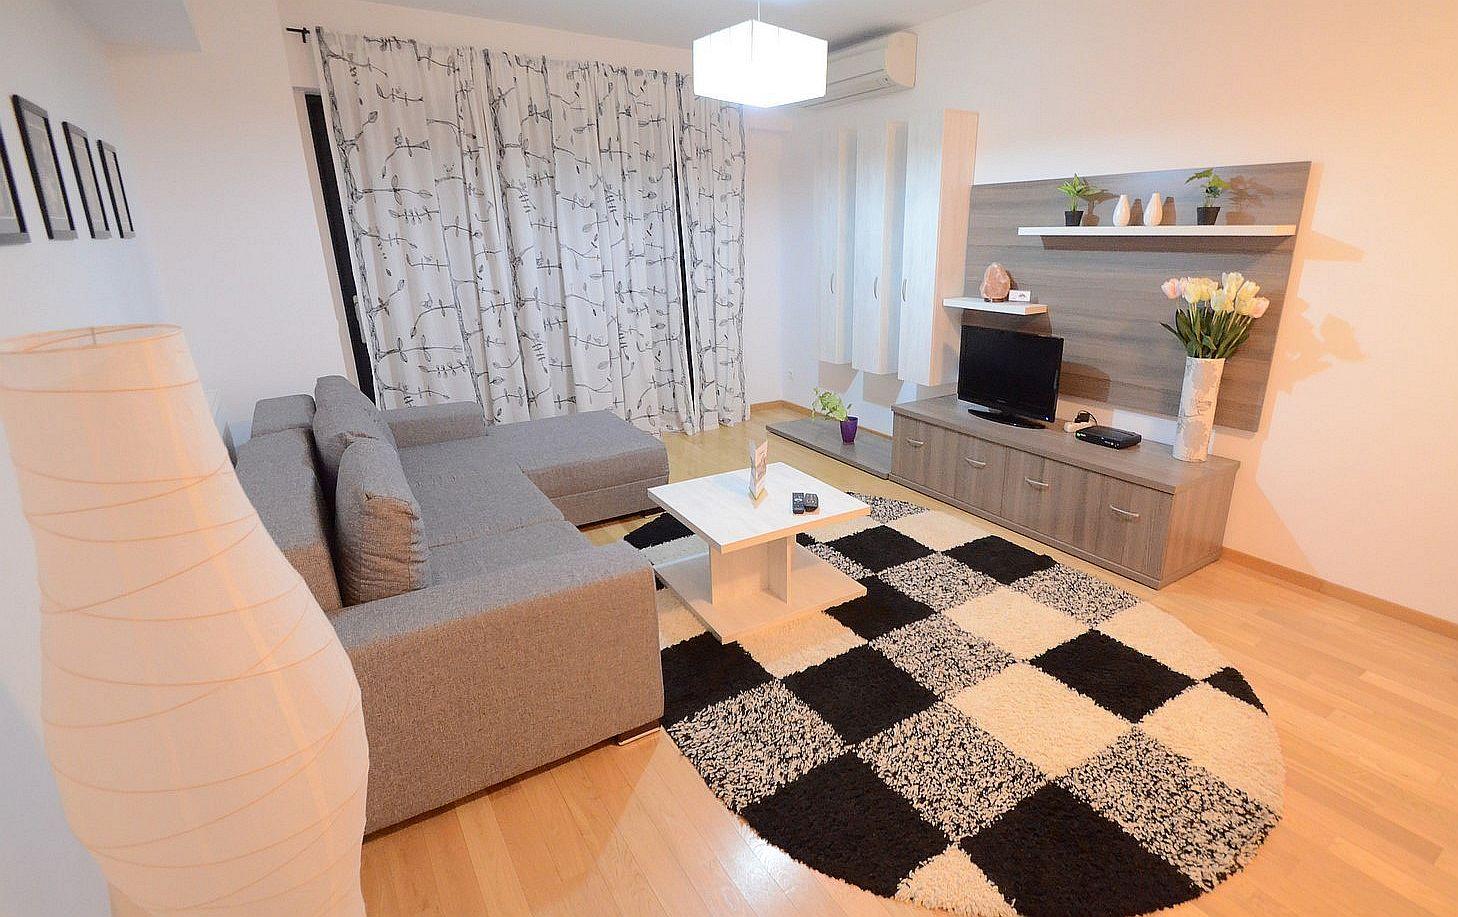 Descopera ce beneficii iti ofera cazarea in regim hotelier for Interior decoration and designing iti